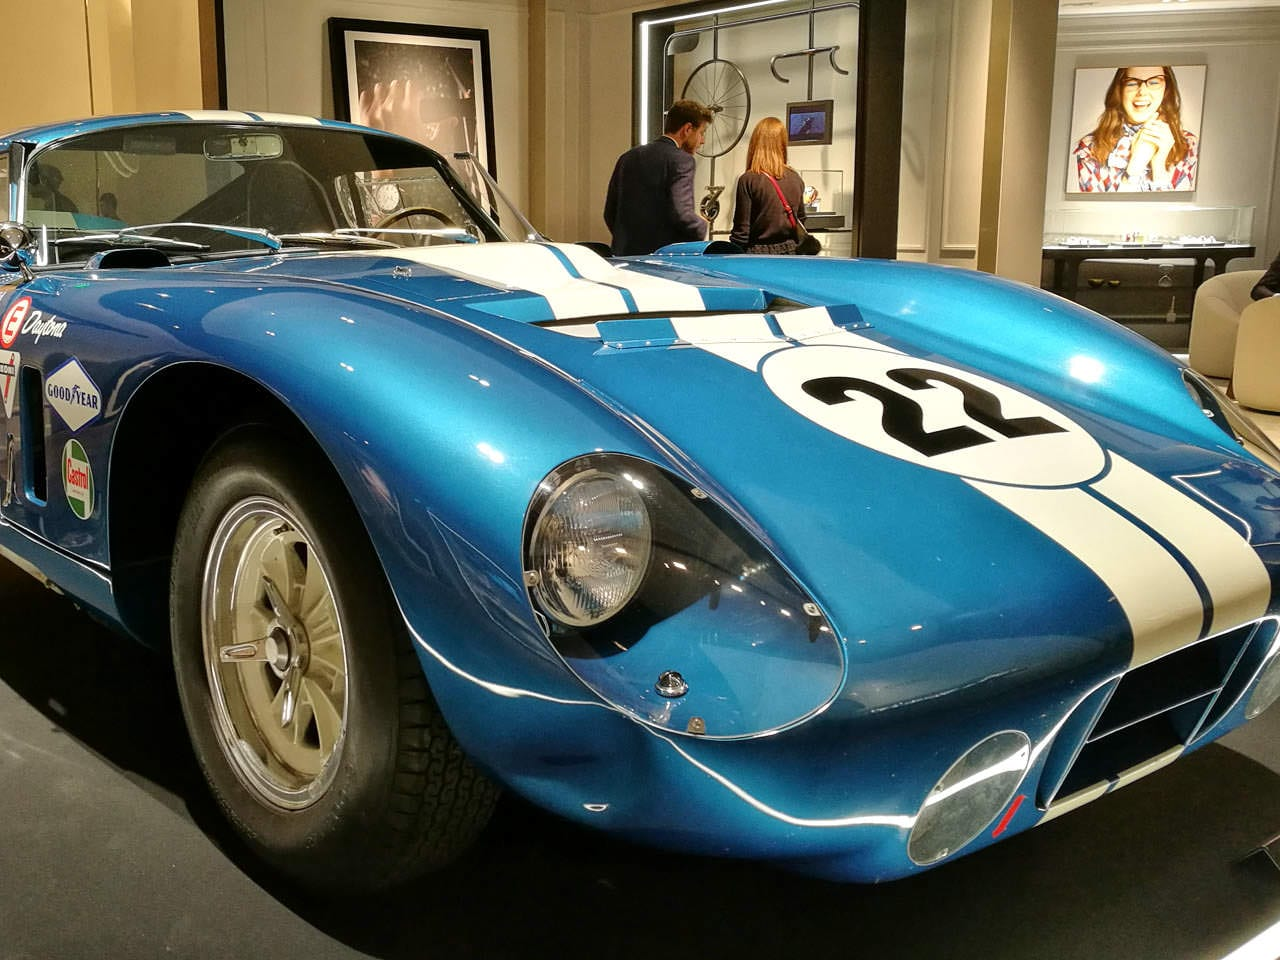 Baume & Mercierin osaston vetonaulana oli Shelby Cobra.